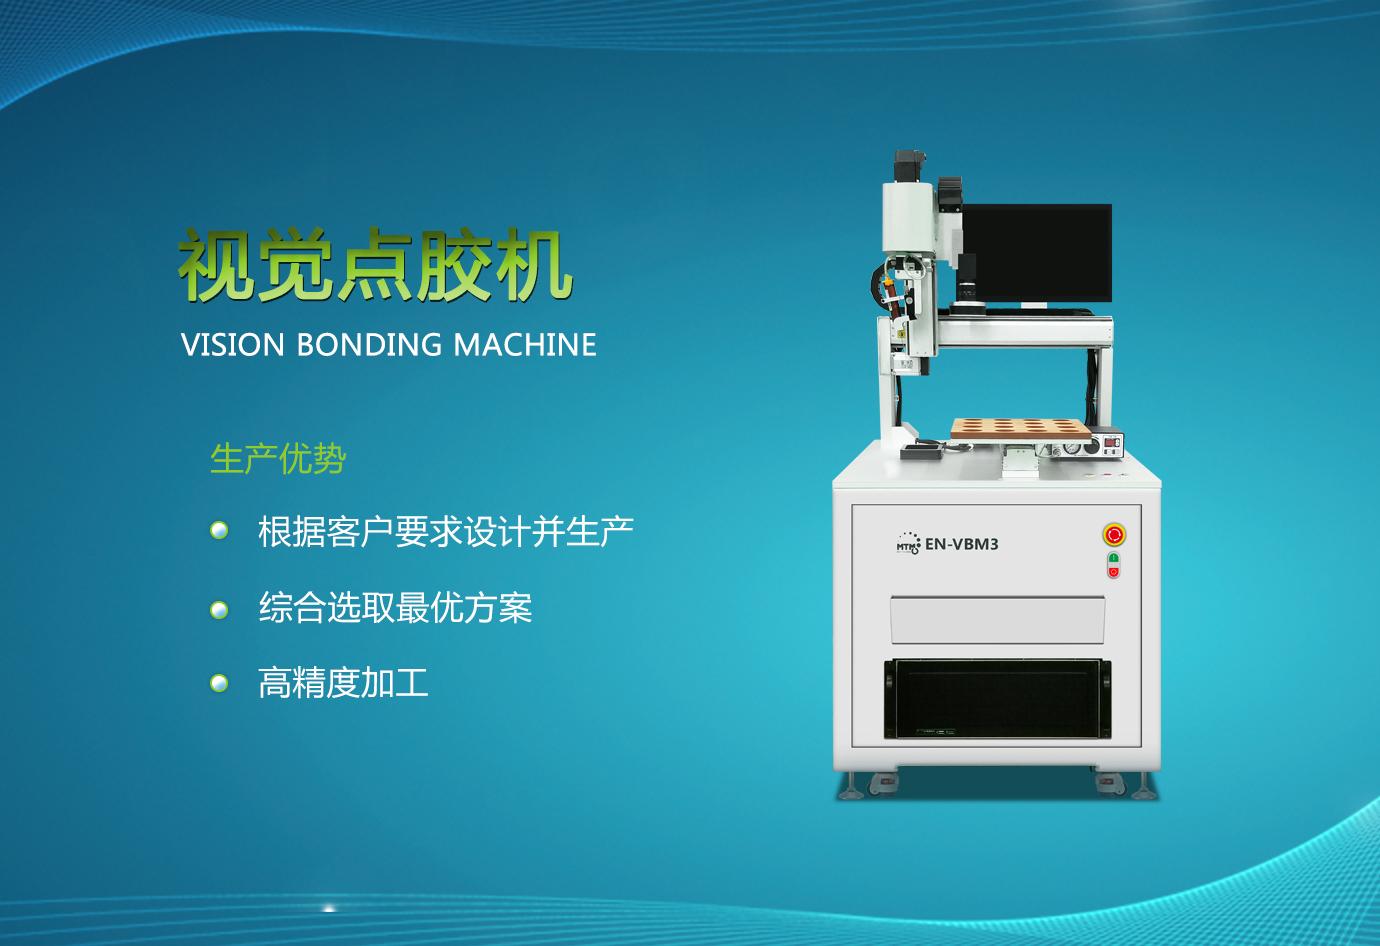 VISION BONDING MACHINE 【EN-VBM3】